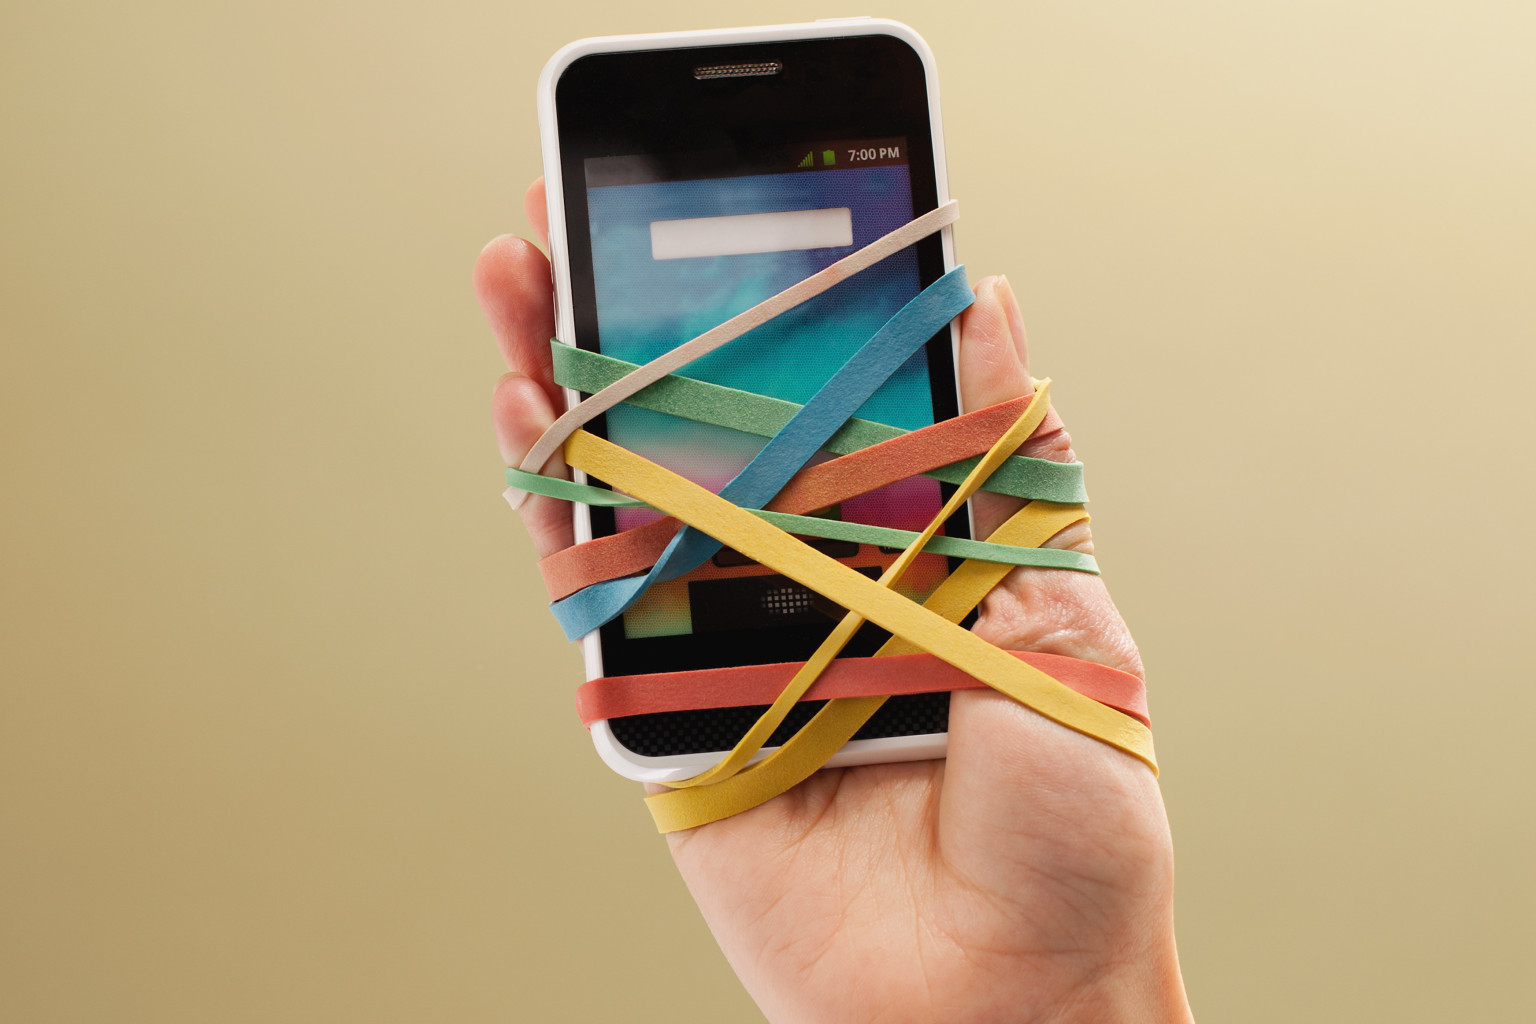 Viviana's Coding Blog: Technology Addiction in Teens